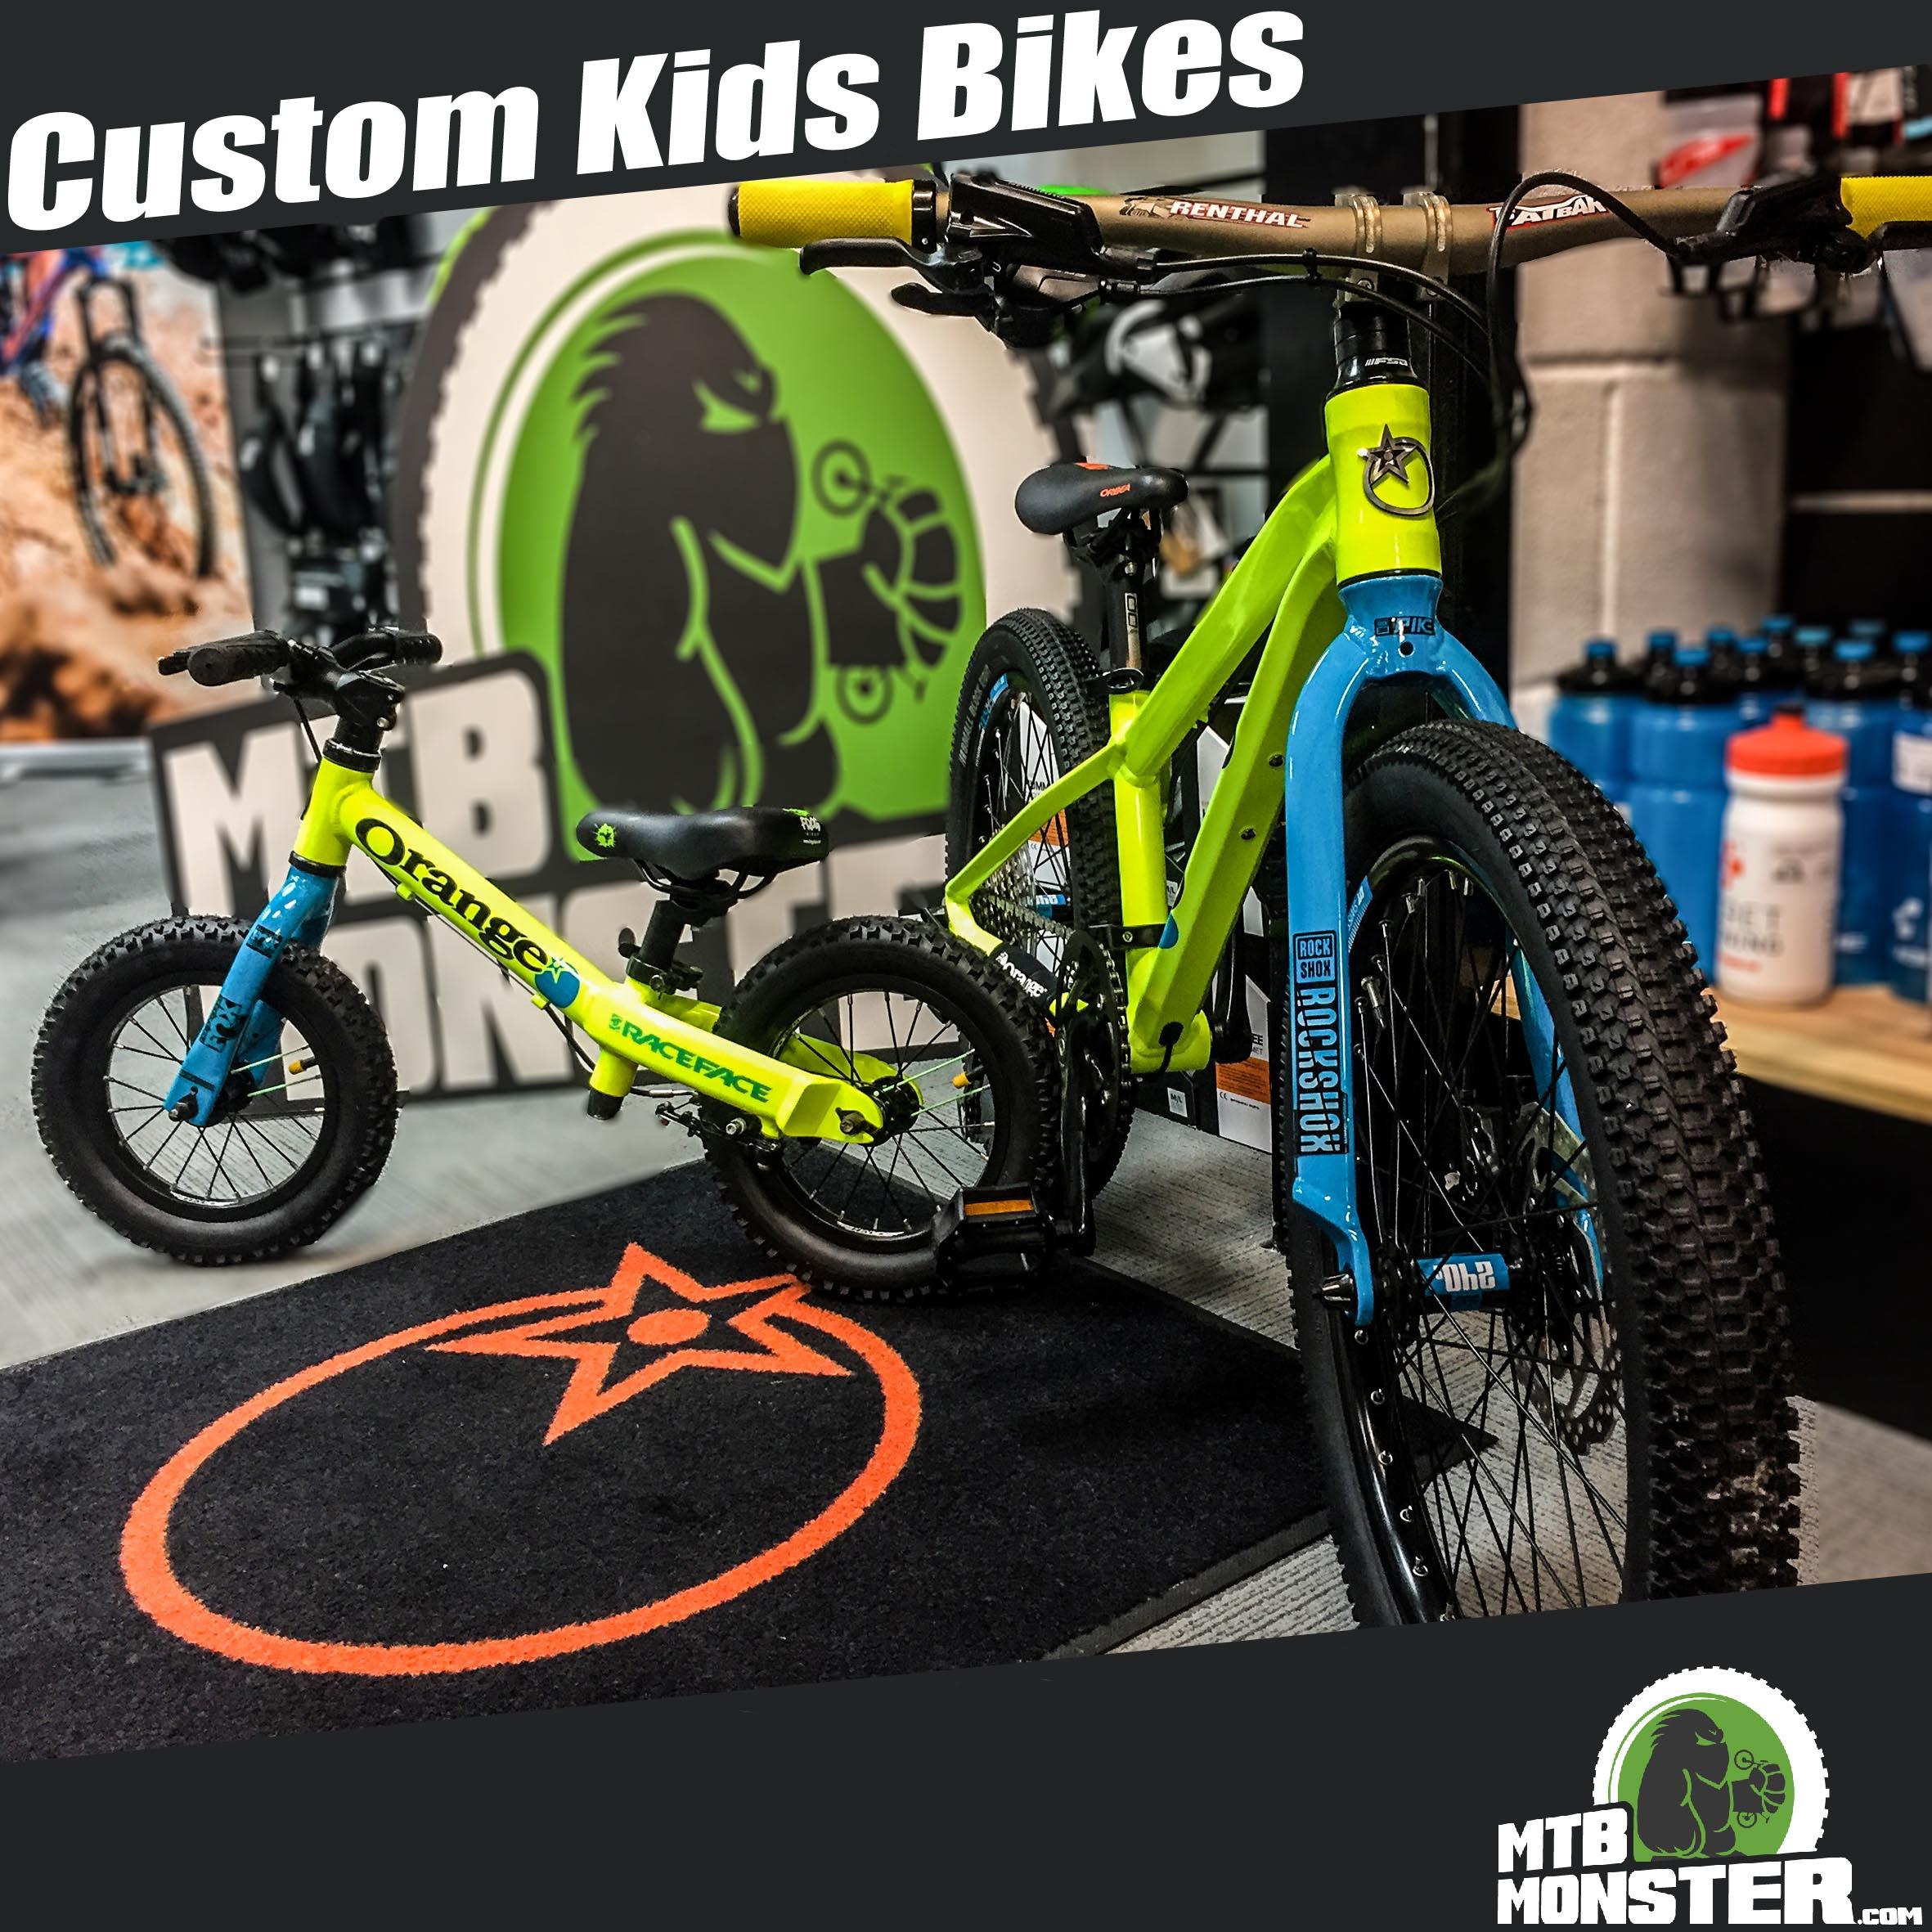 Custom Kids Bikes